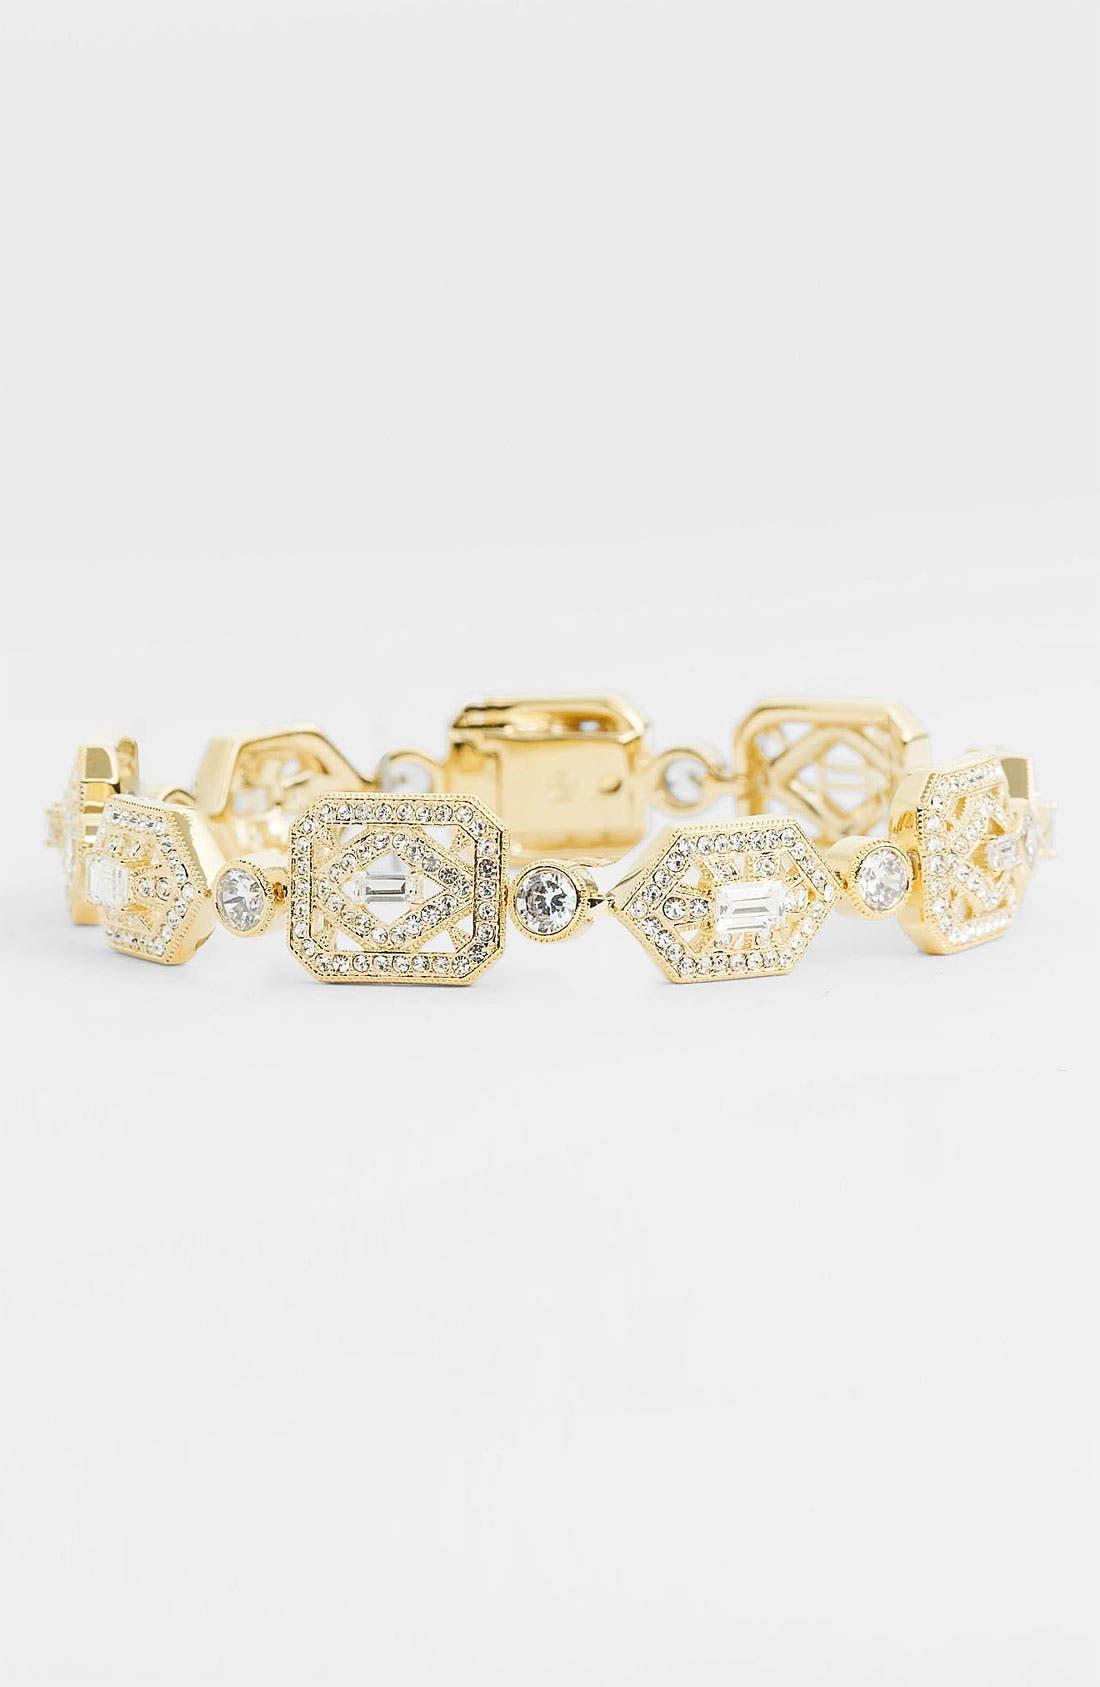 Alternate Image 1 Selected - Nadri 'Art Deco' Line Bracelet (Nordstrom Exclusive)